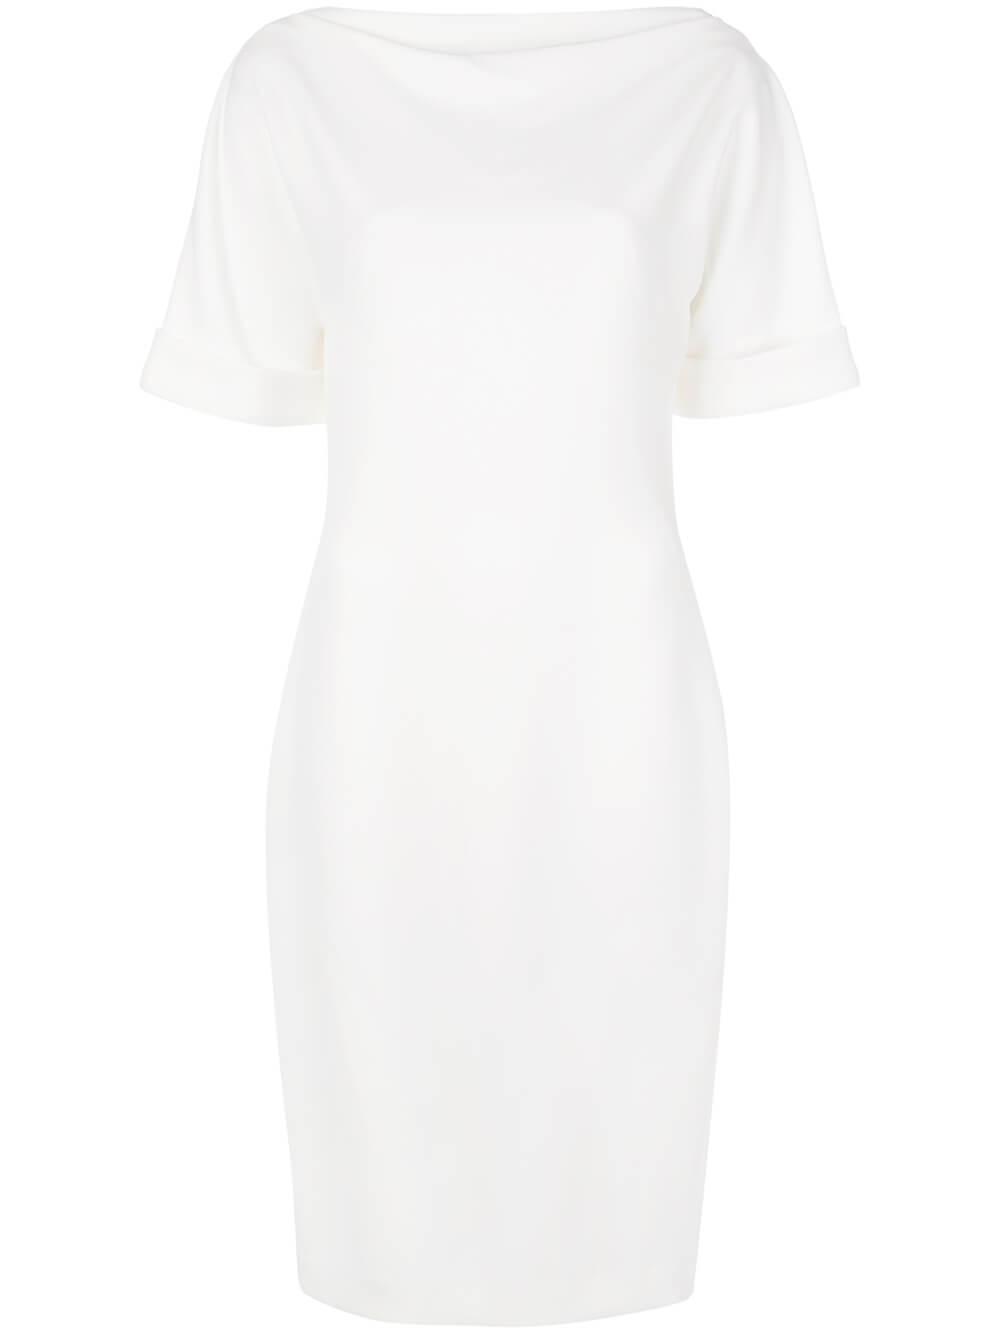 Short Sleeve Cocktail Dress Item # BSD4442